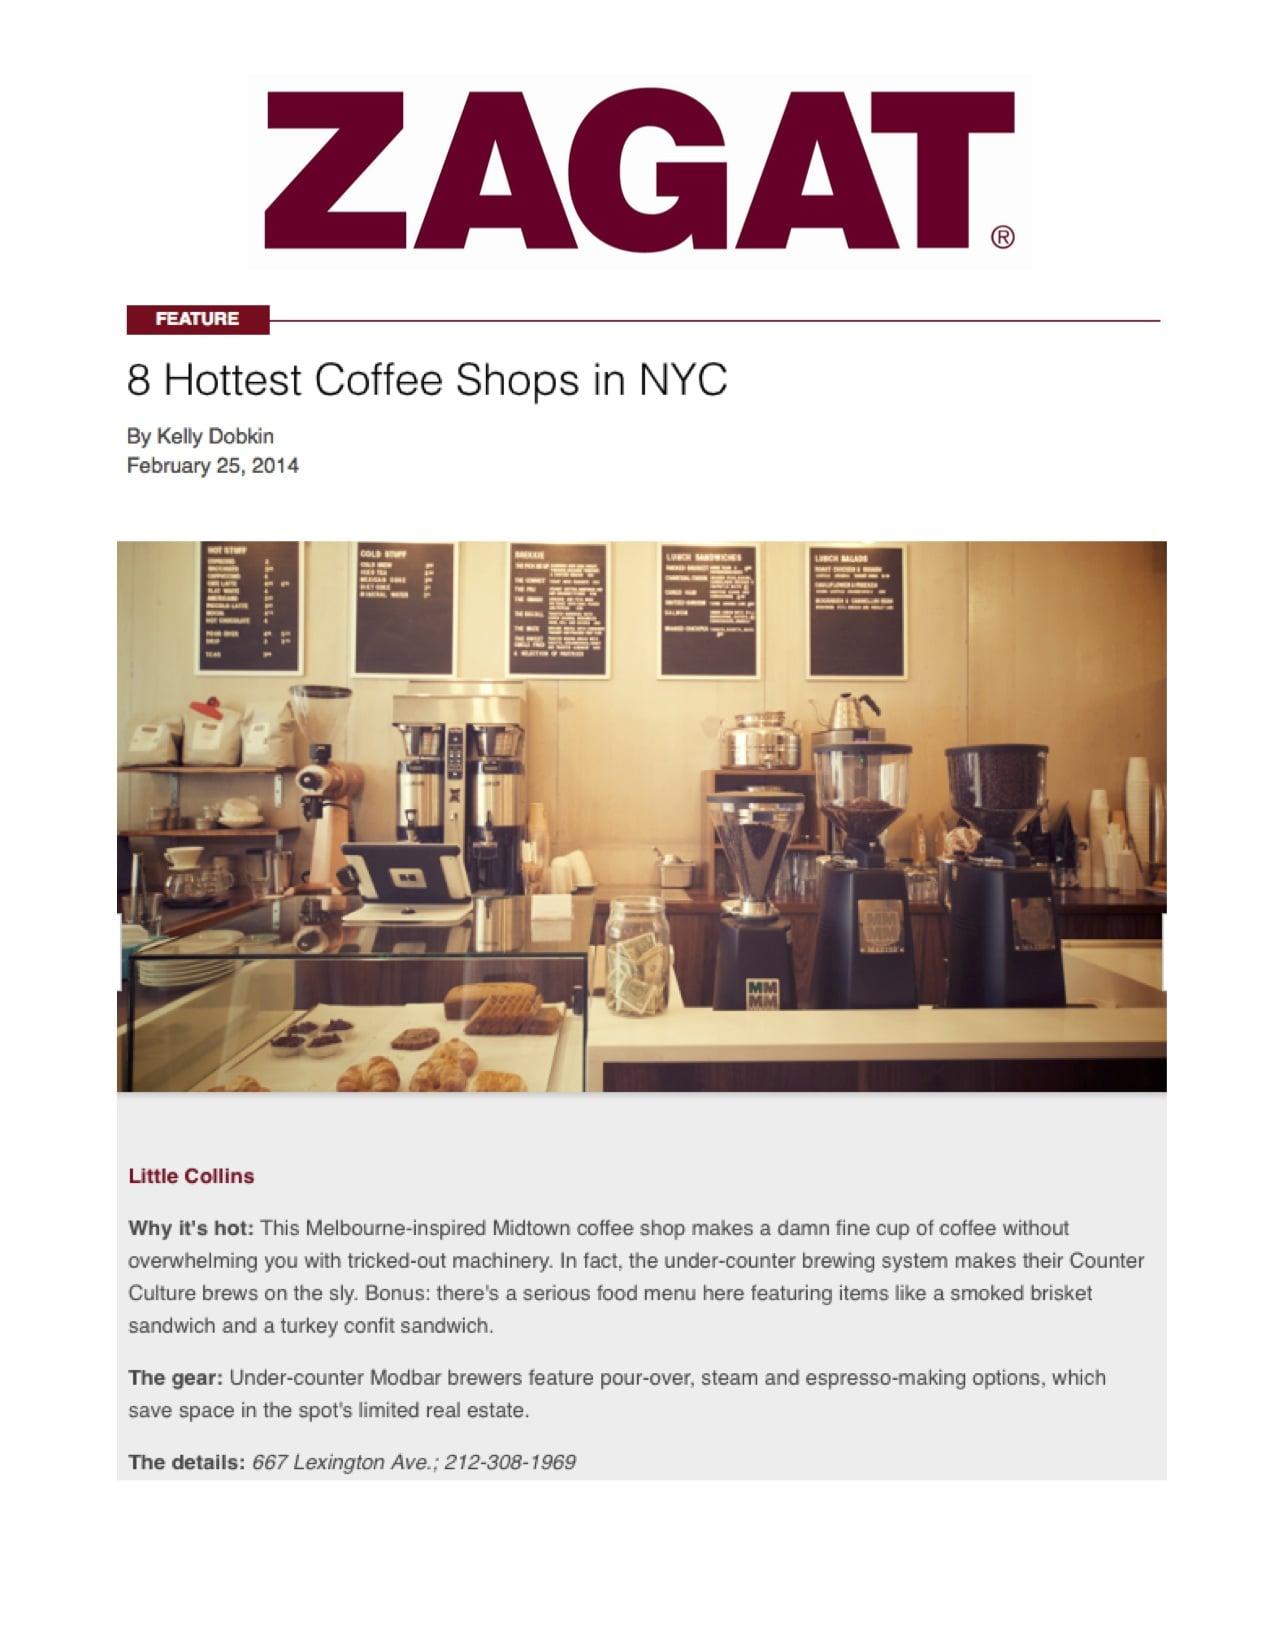 Zagat2.jpg